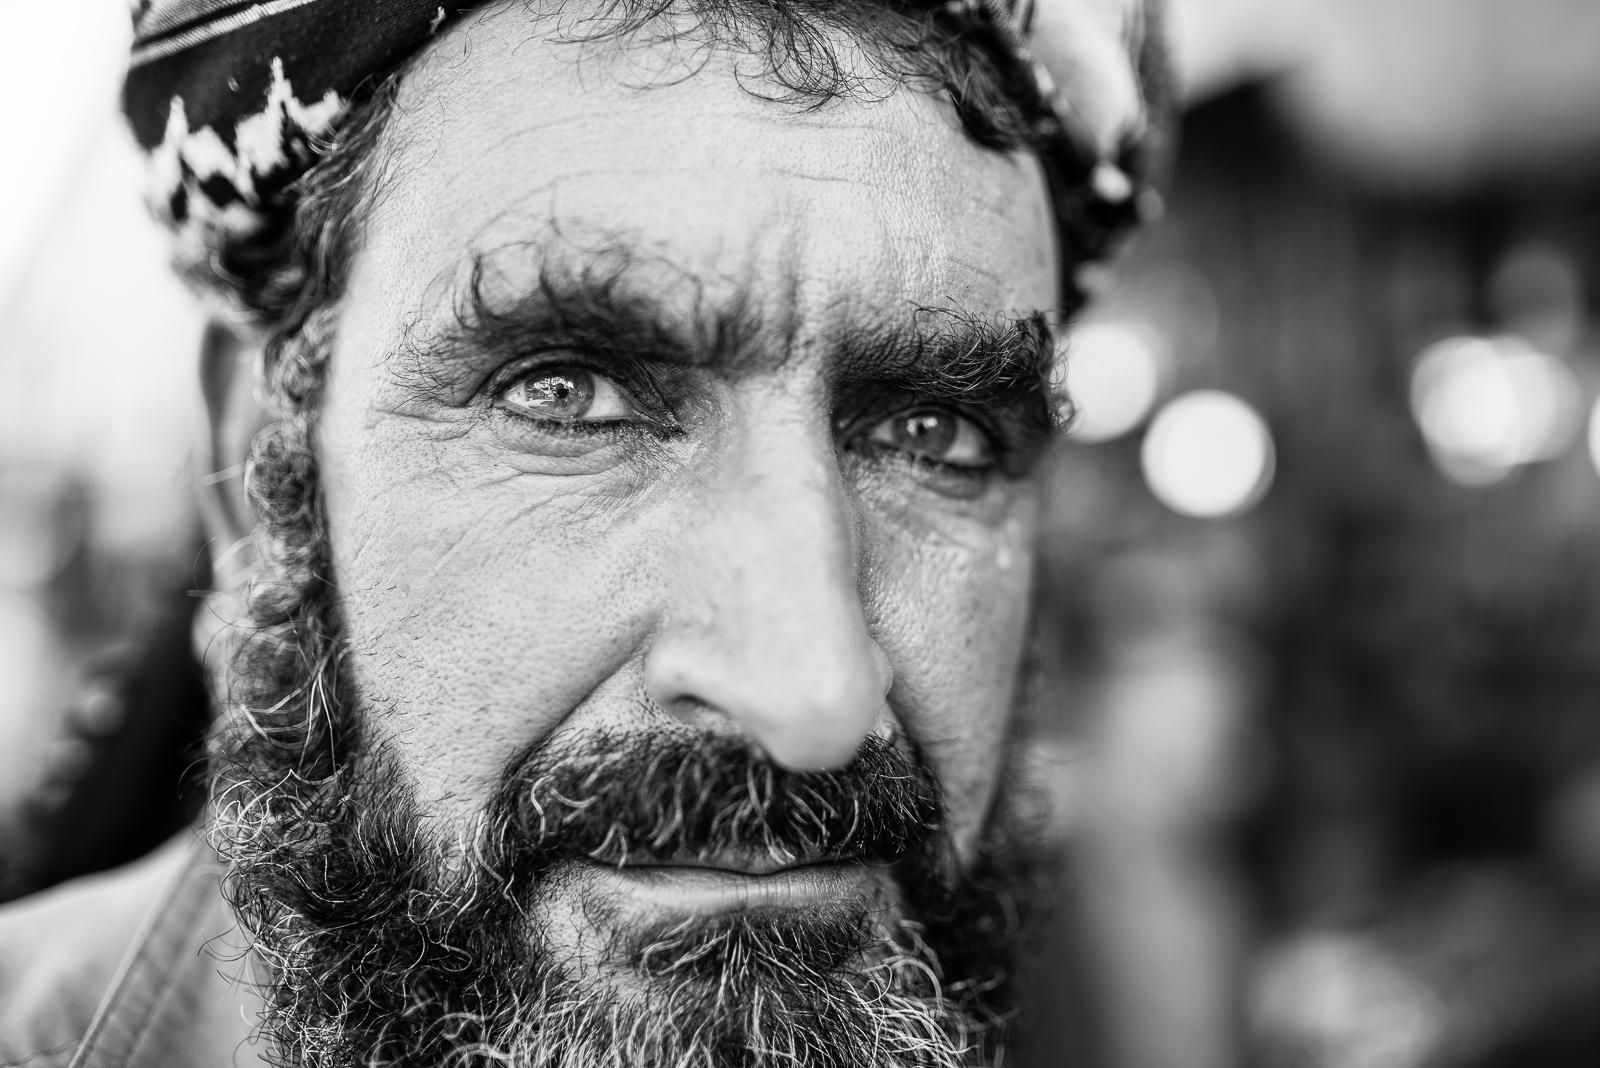 Portrait from the street, Diyarbakir (Turkey)